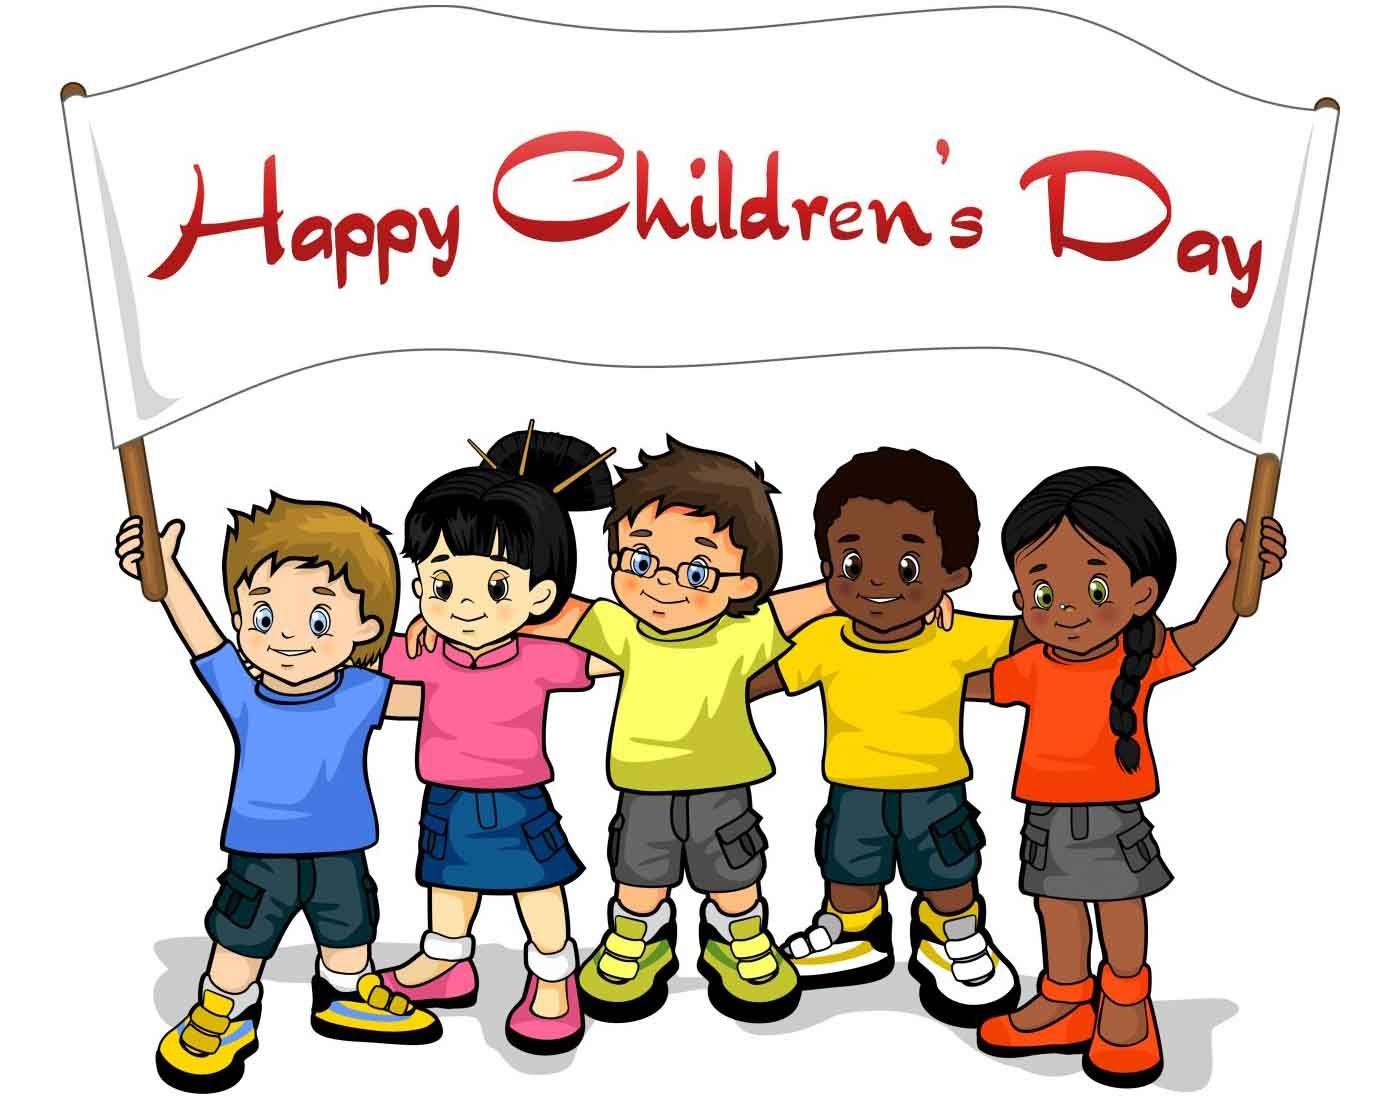 International Children's Day, celebrated JUNE 1.